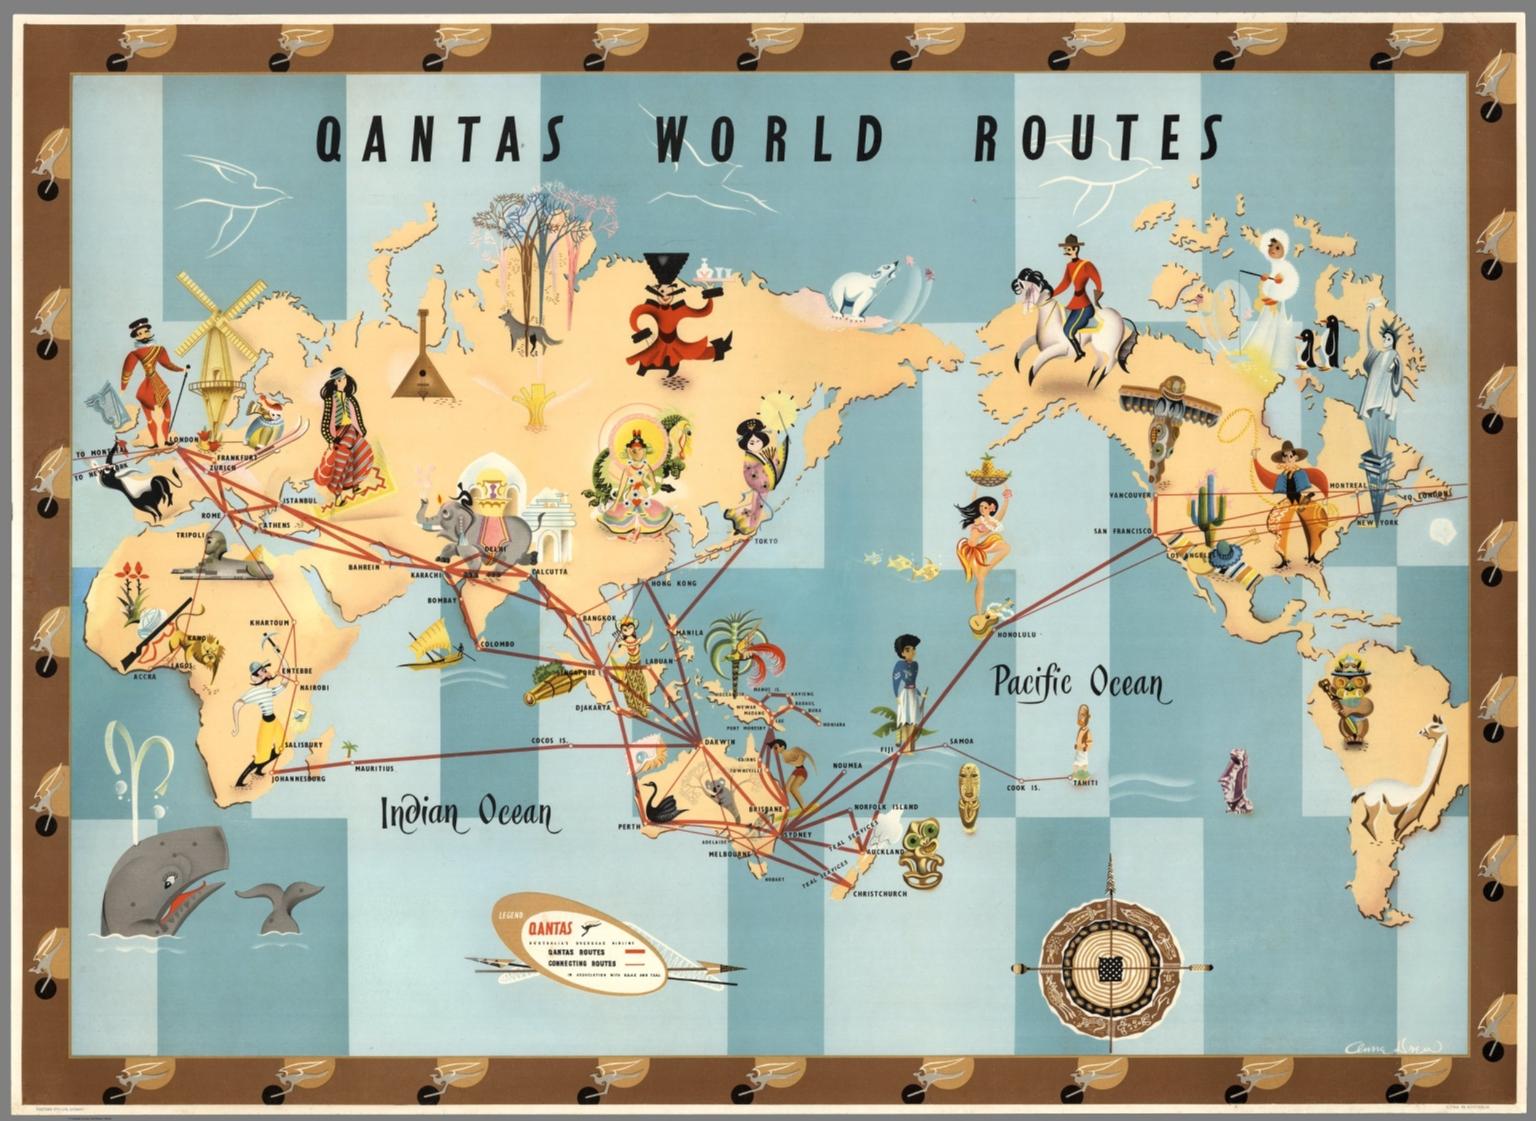 Qantas world routes anna drew david rumsey historical map collection qantas world routes anna drew gumiabroncs Gallery